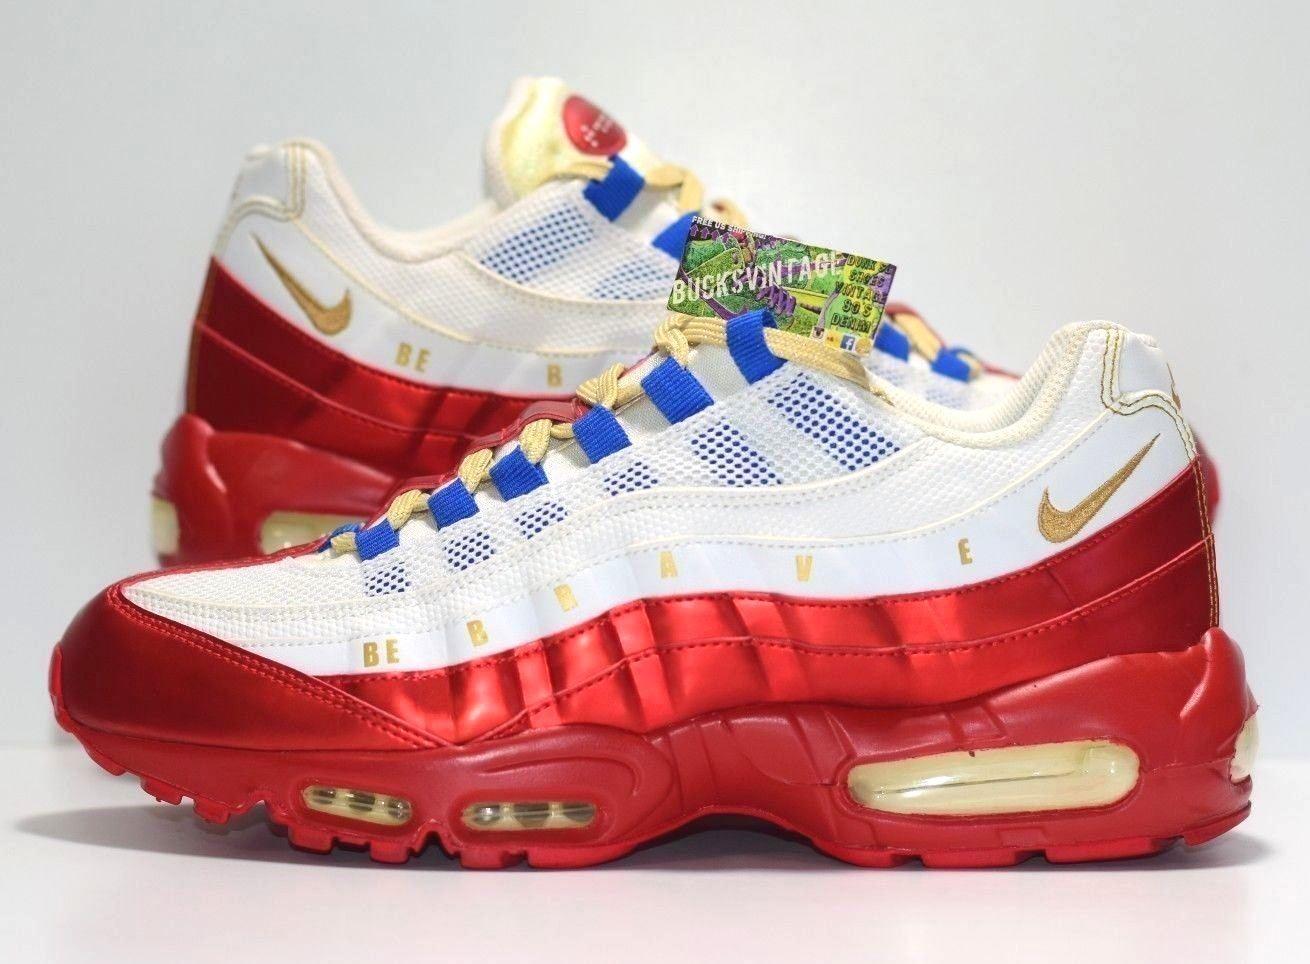 promo code 875d0 70aa9 Size 9 | 2011 Nike Air Max 95 Doernbecher Daniel Blair 507450-180 ...